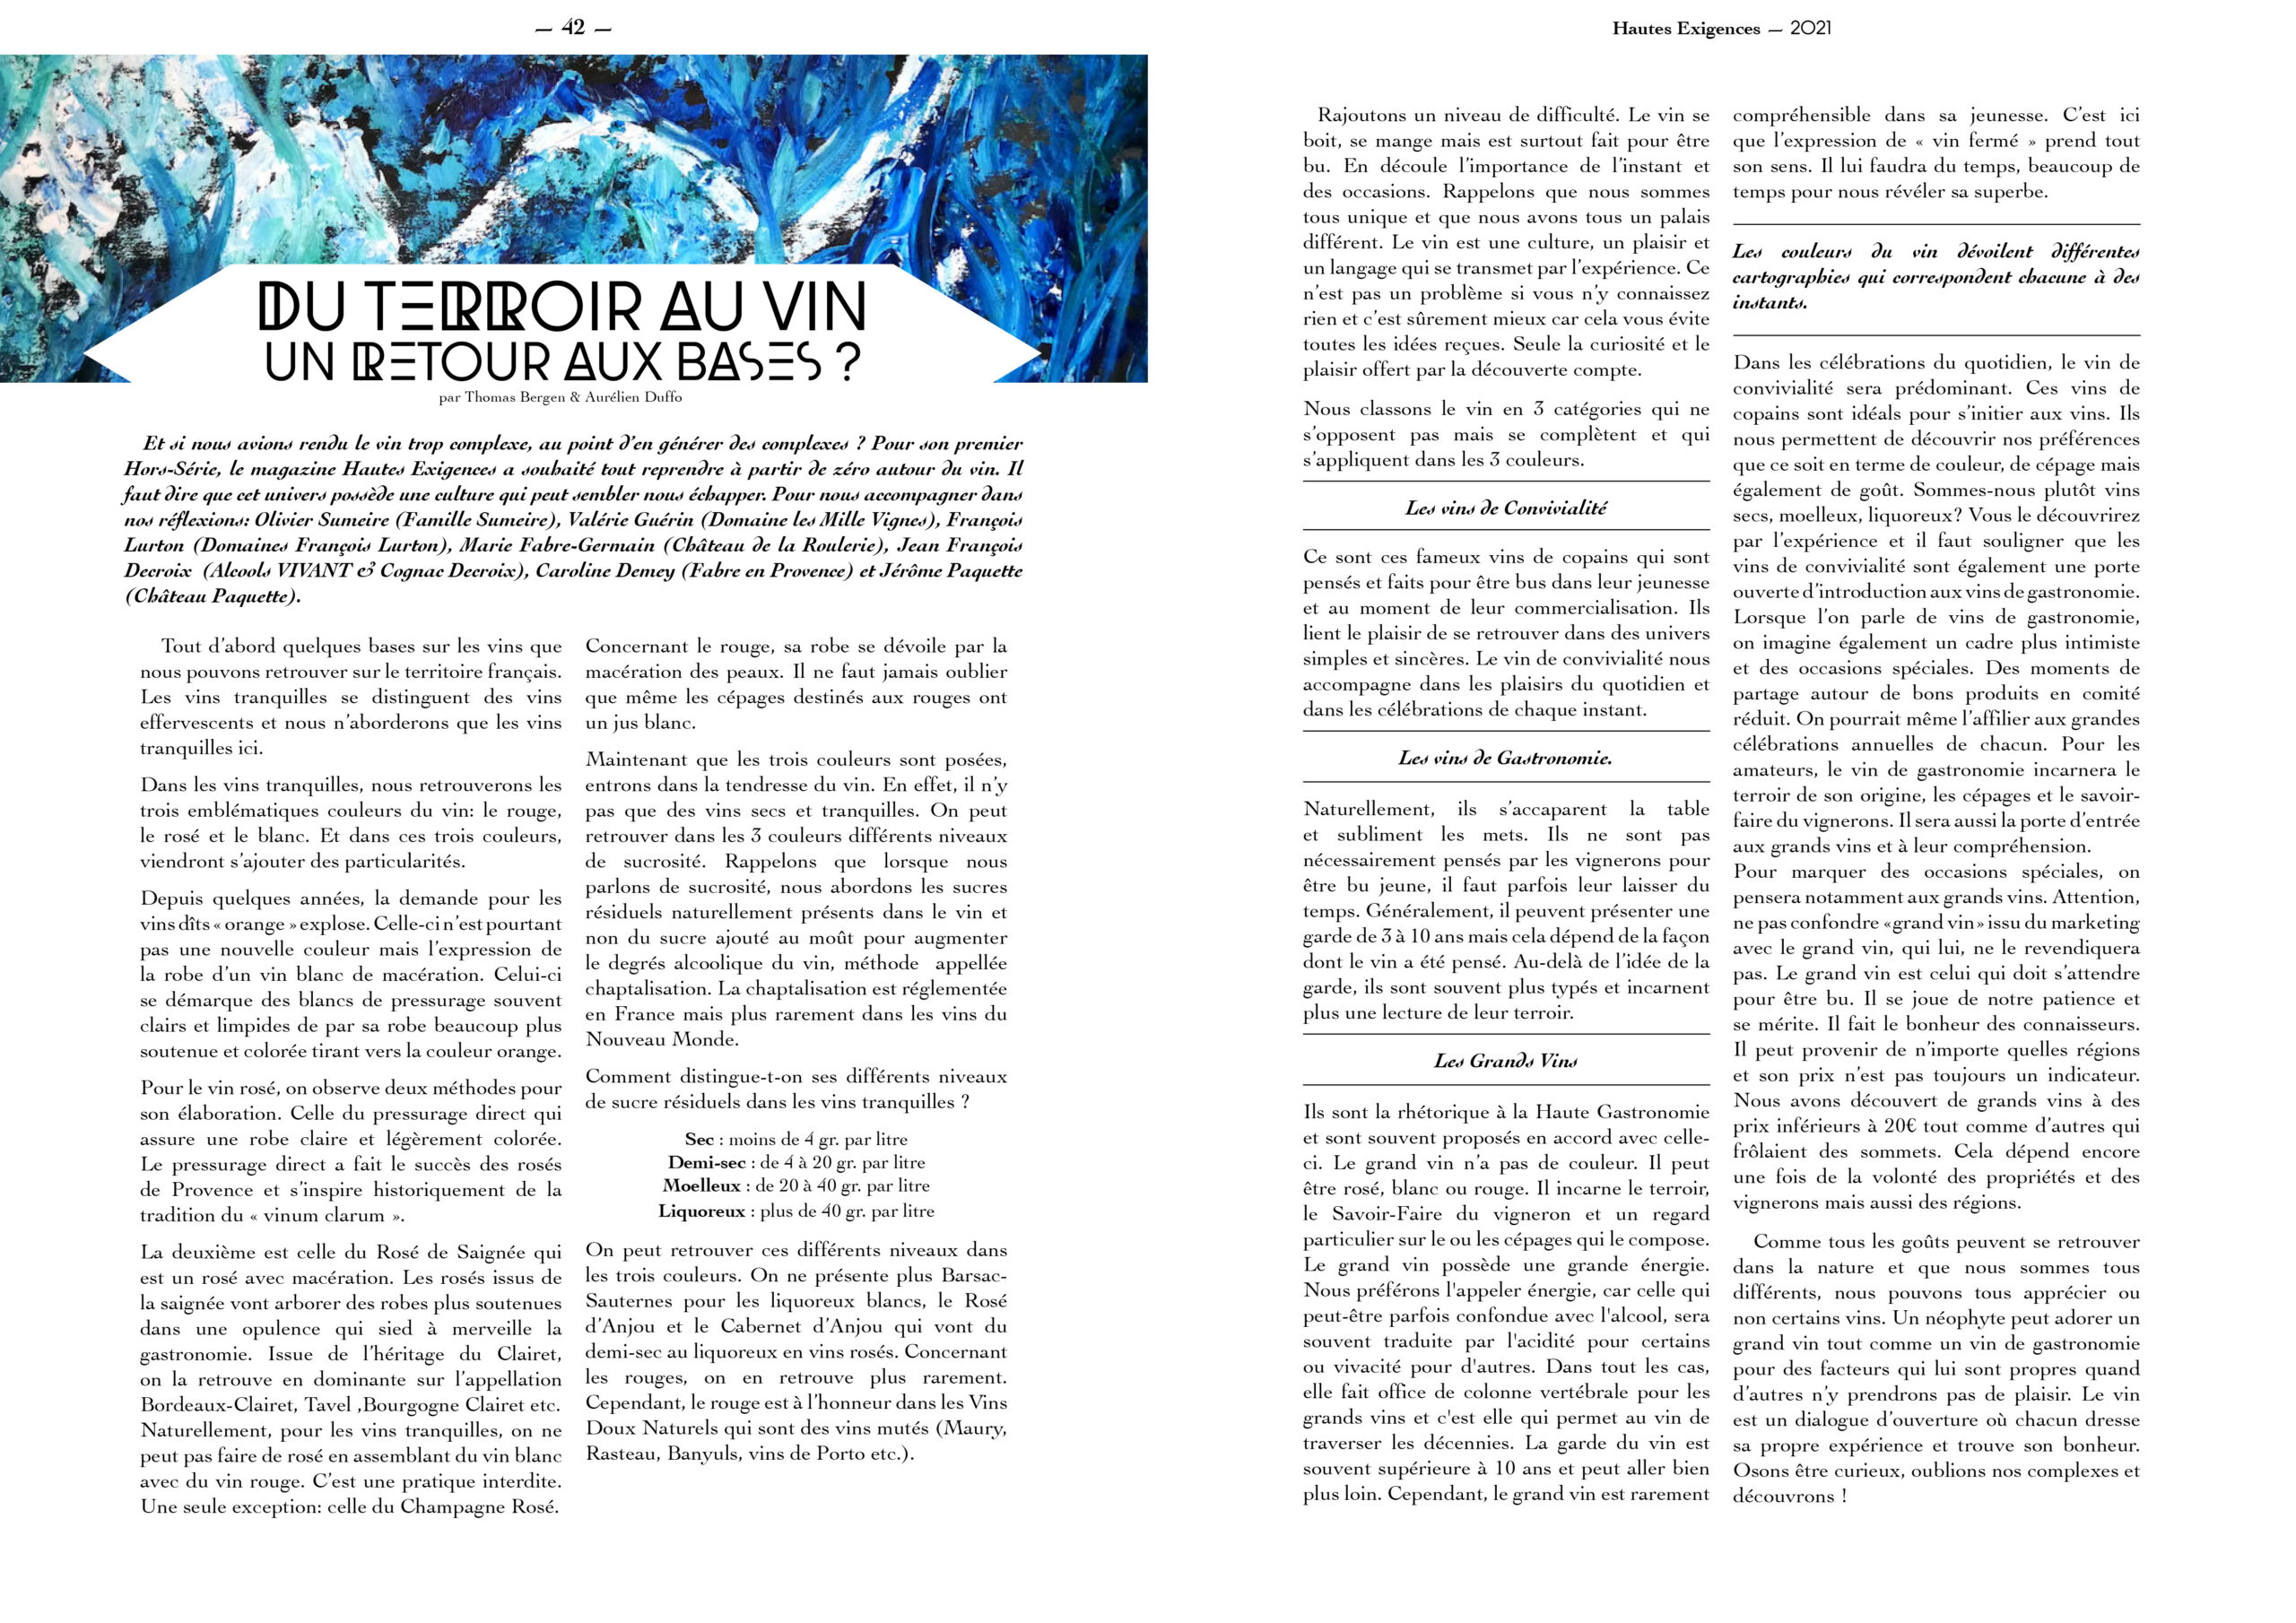 Hautes Exigences Magazine Hors Serie 2021 page 42-43